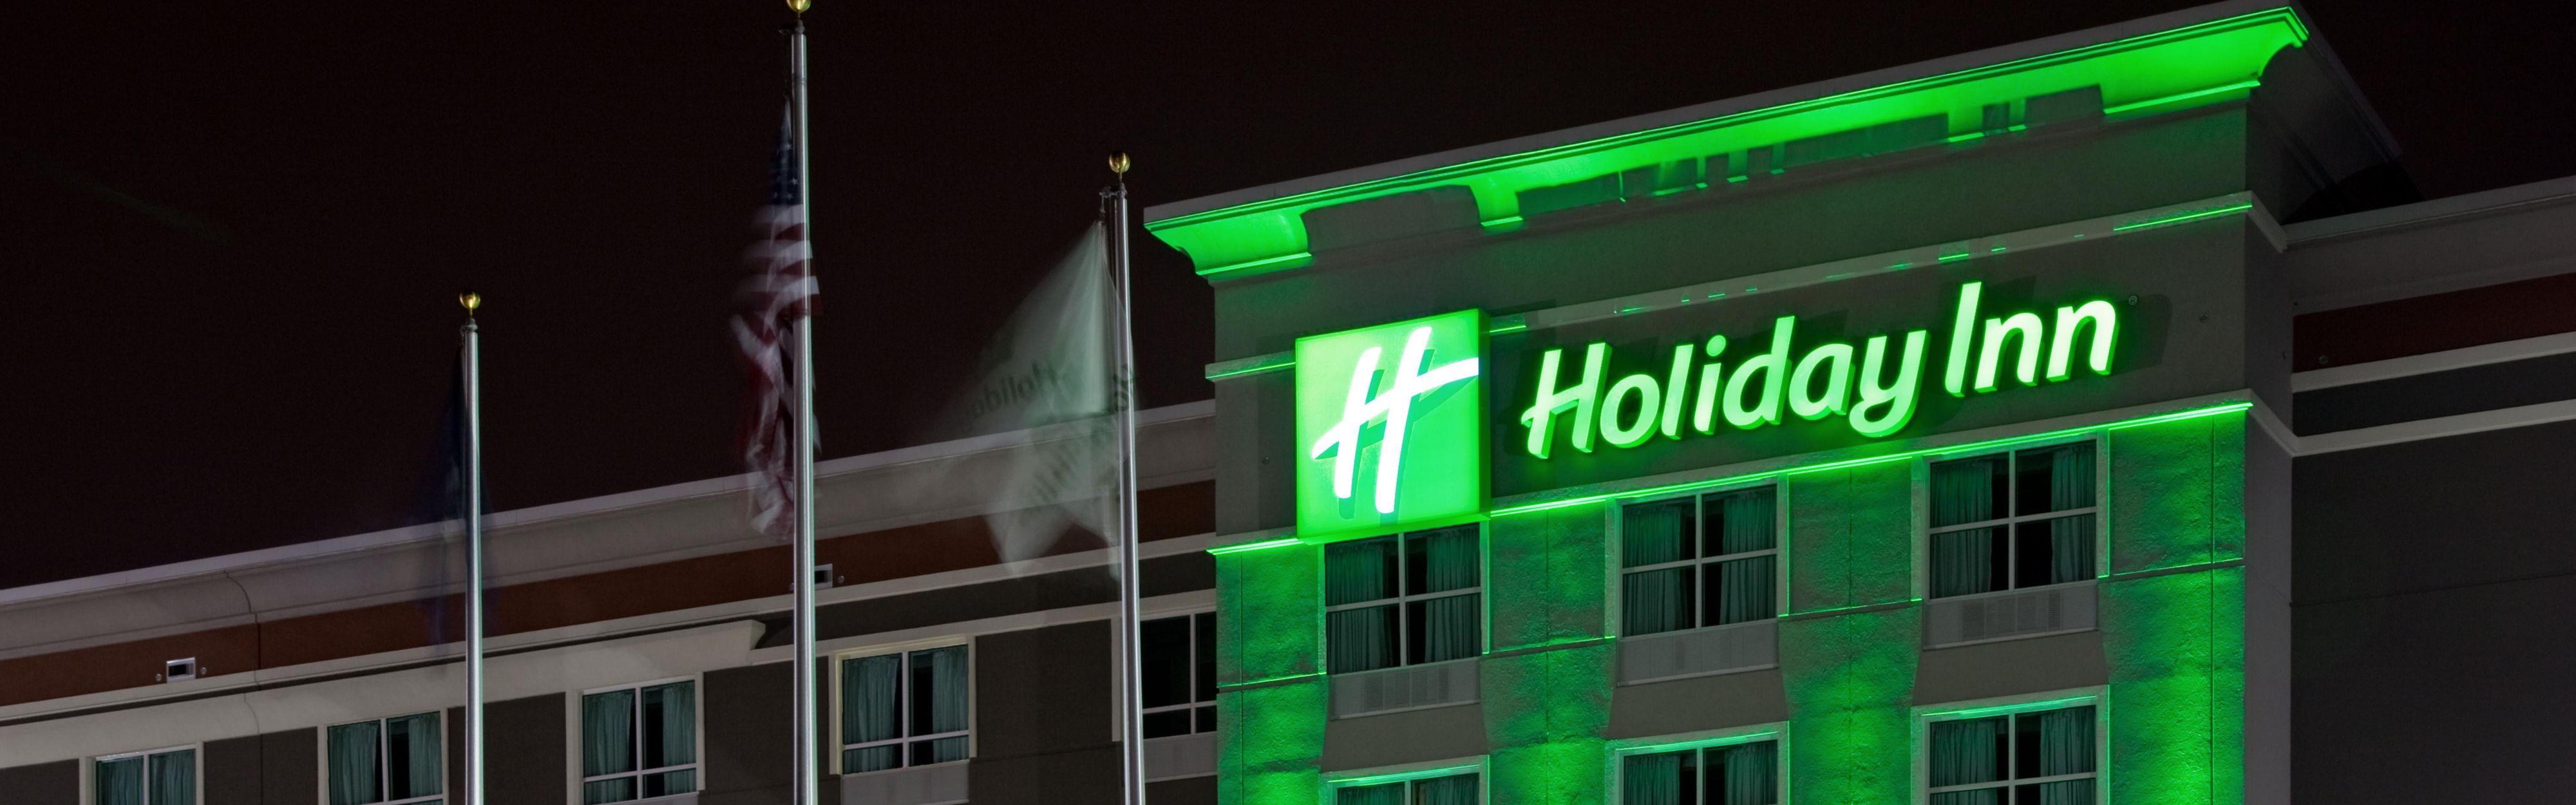 Holiday Inn Florence image 0